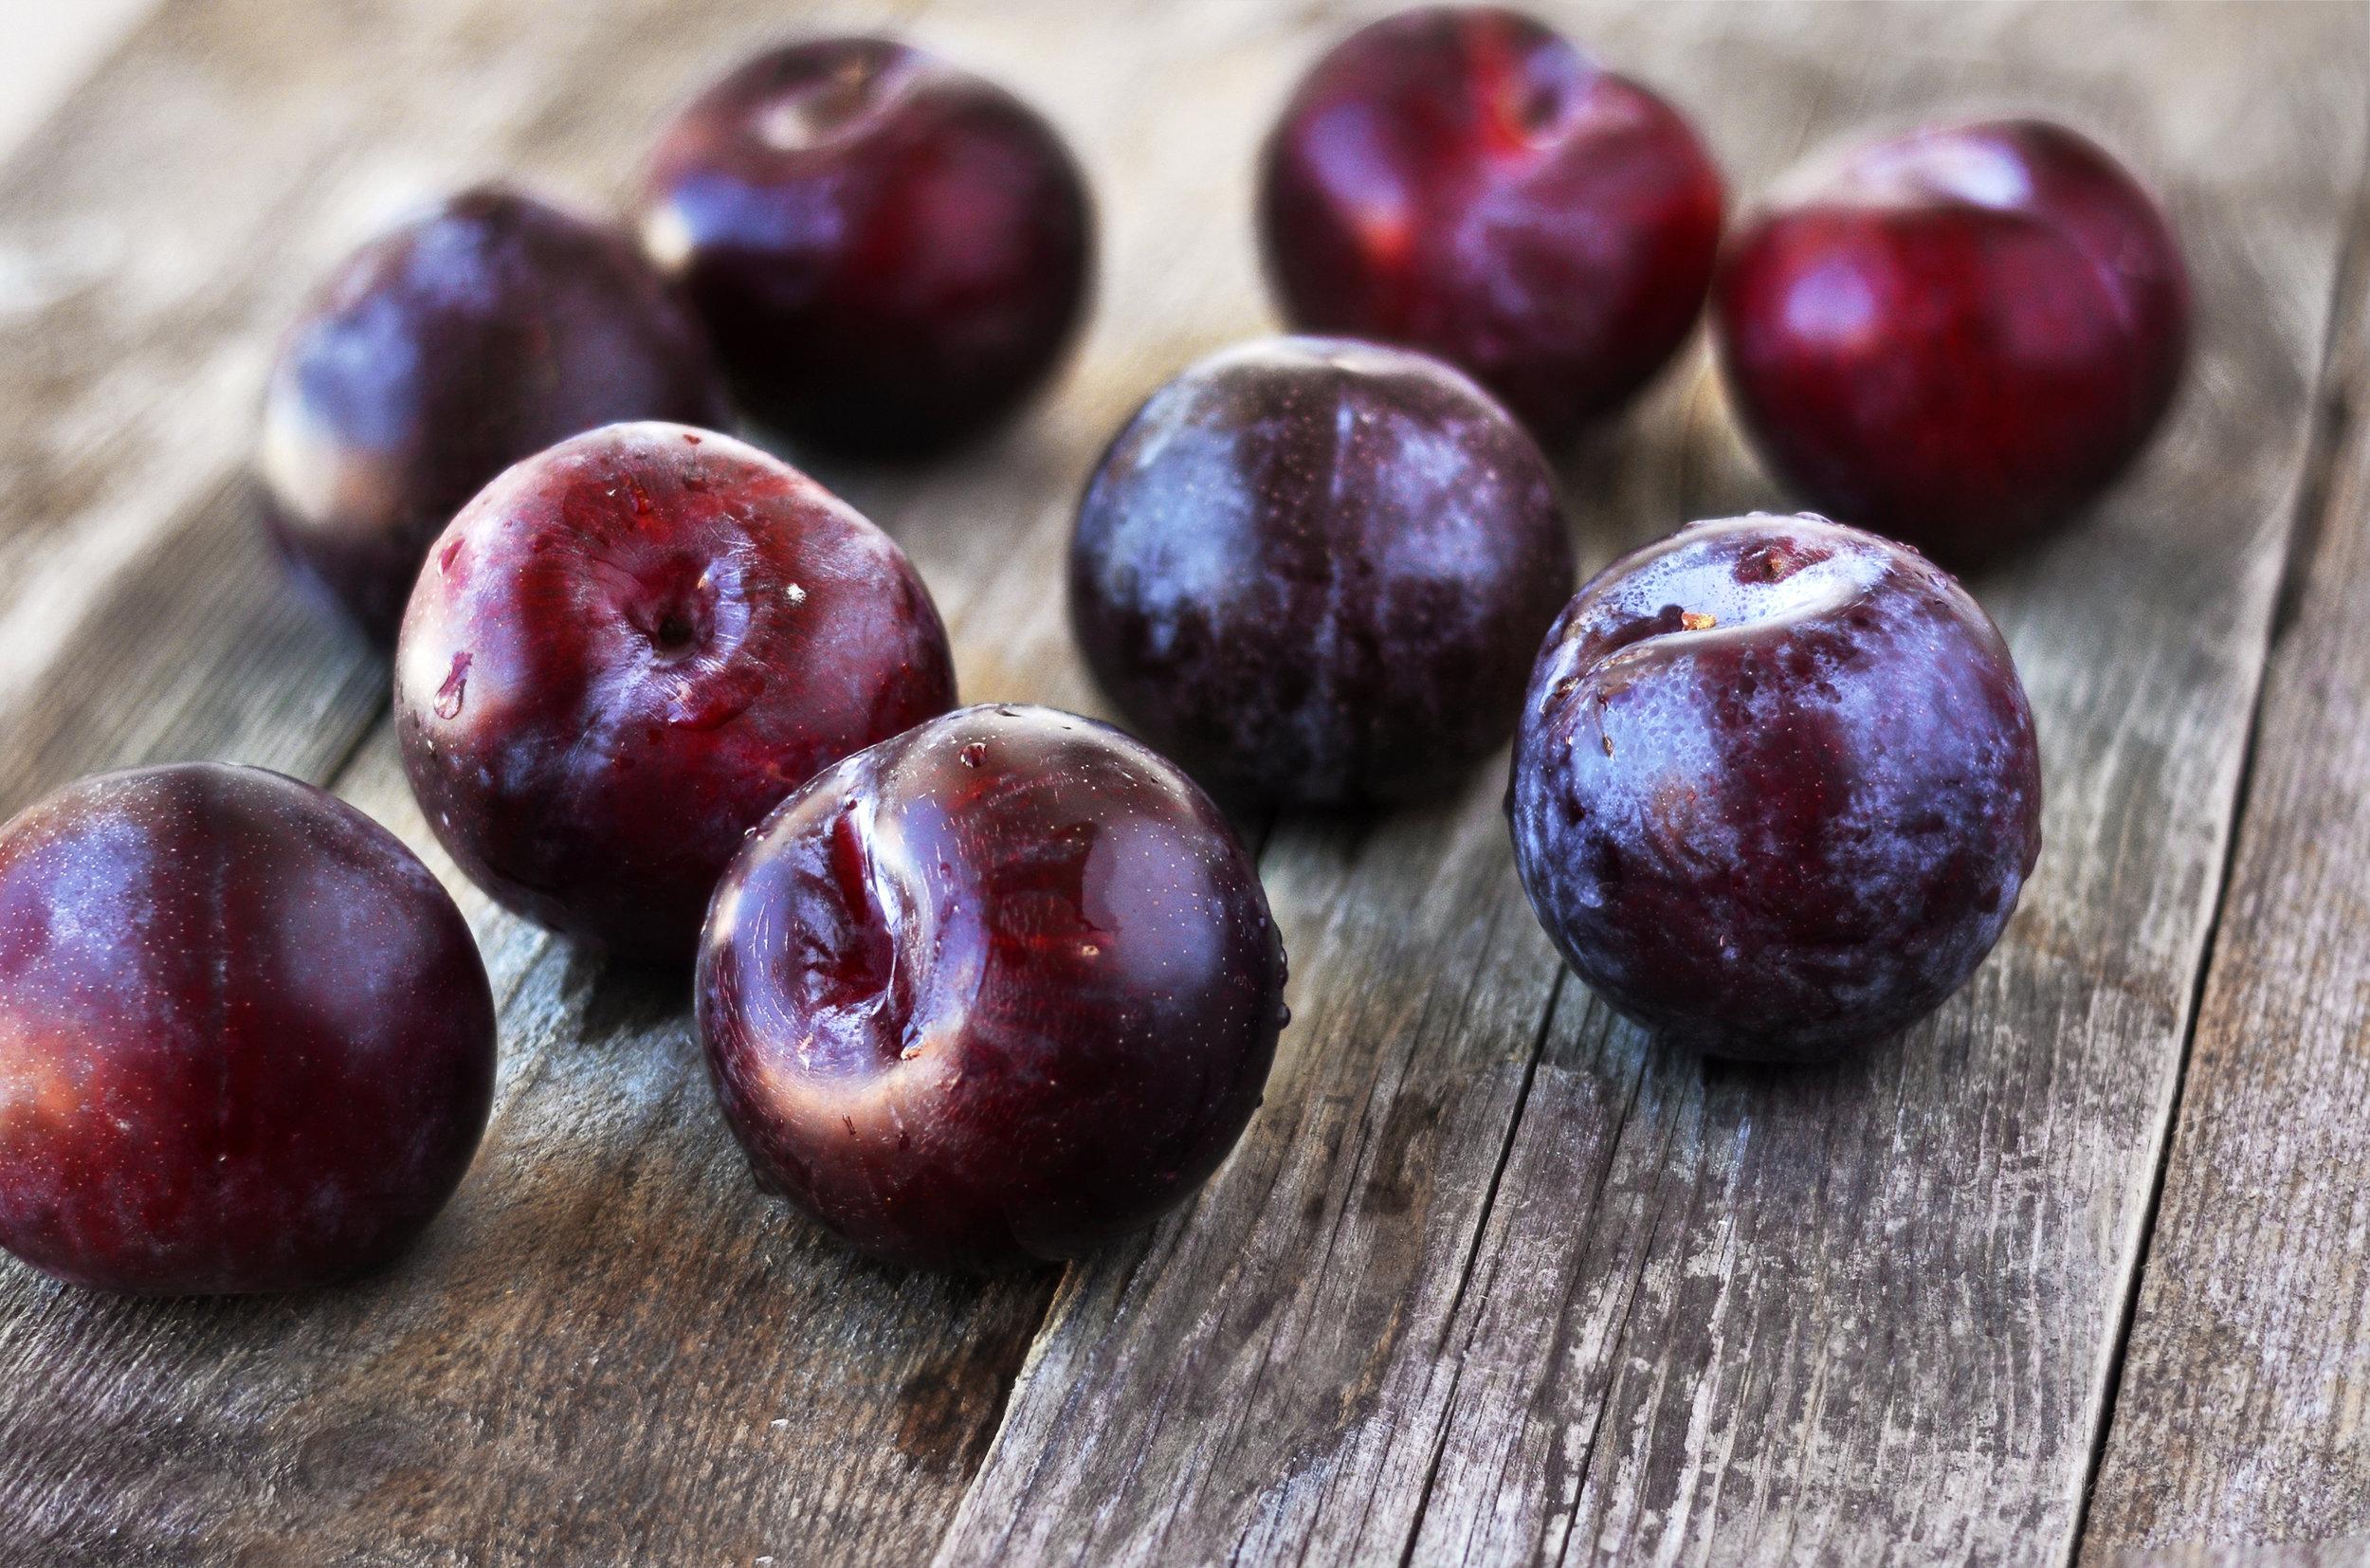 Prunus-domestica.-Ripe-Plums-on-the-wood-backgraund.-527900334_2871x1900.jpeg